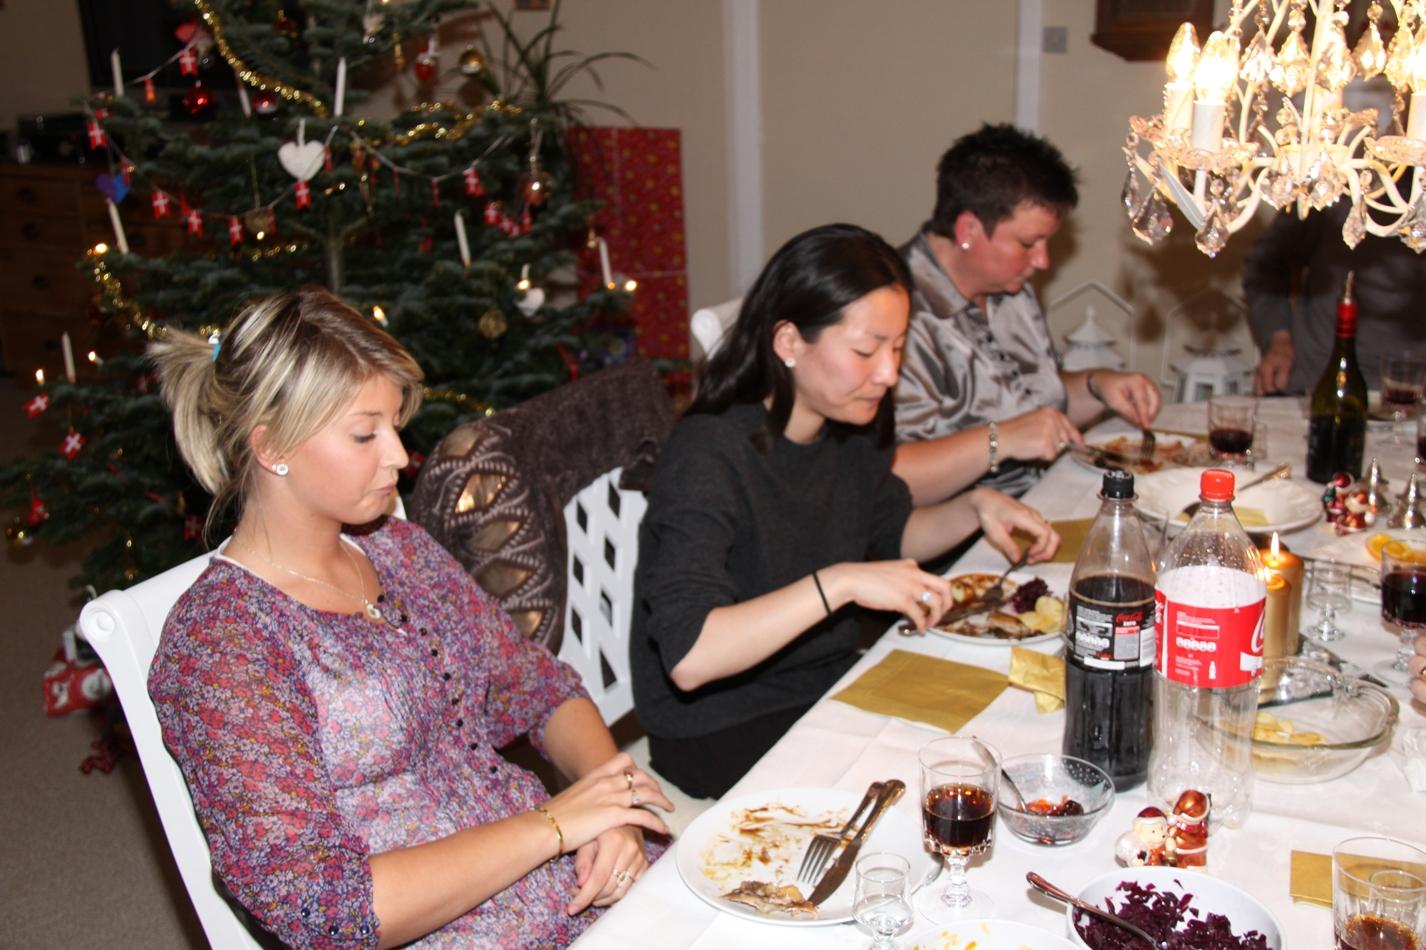 IMG_6374 JULEAFTEN 24-12-2008 (51)